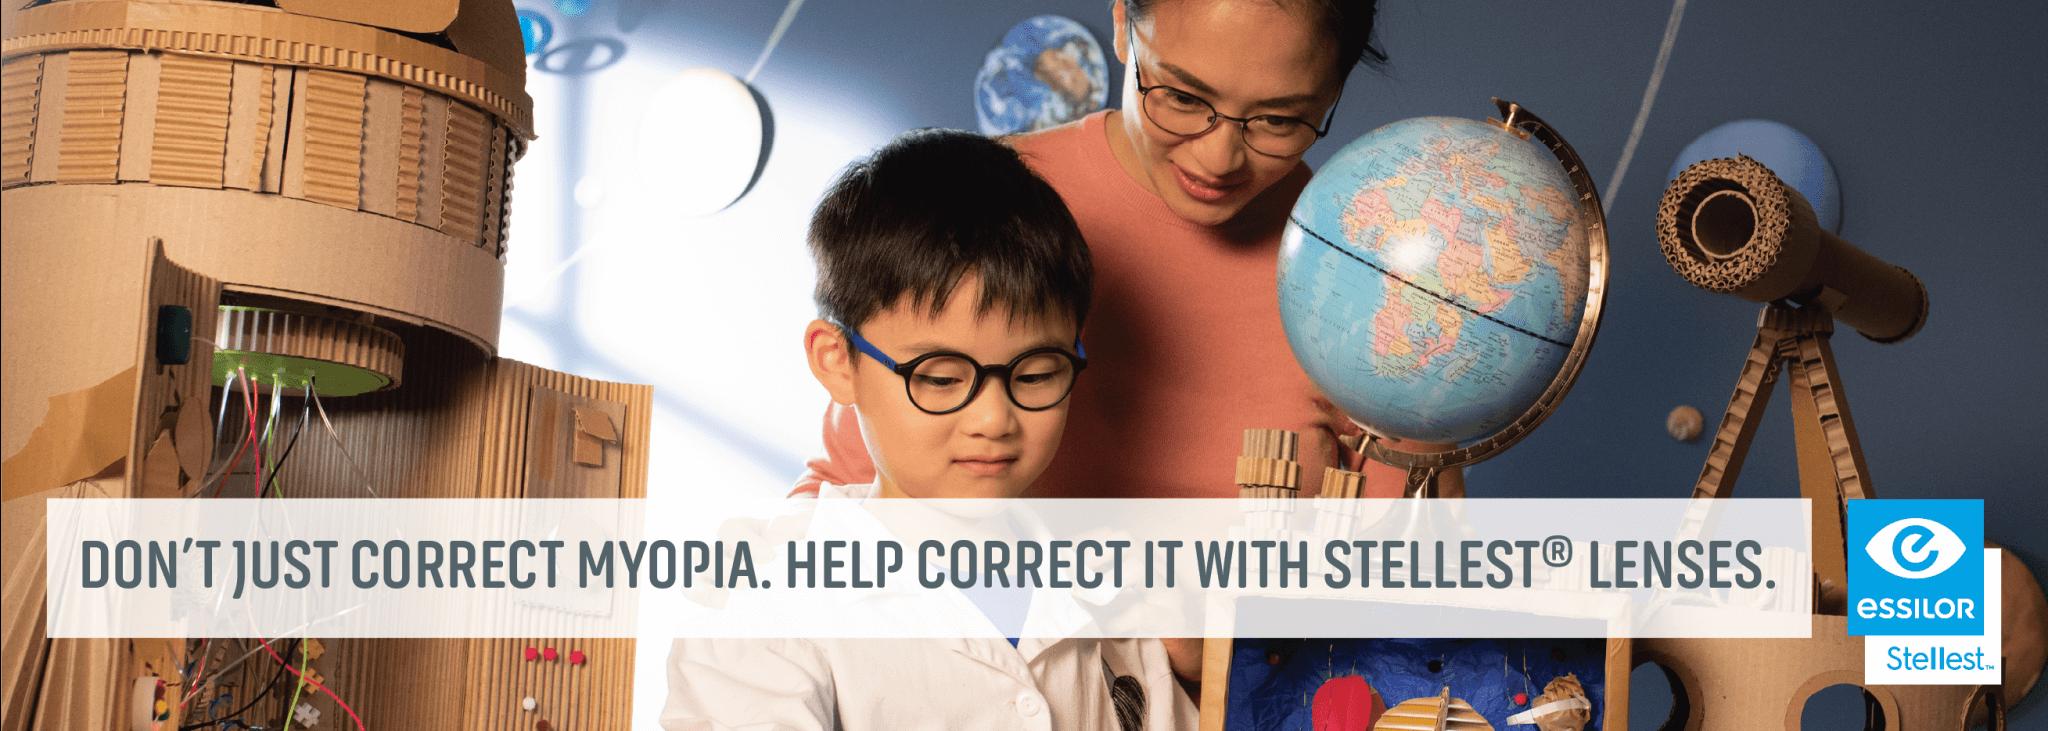 Correct Myopia With Stellest Lenses